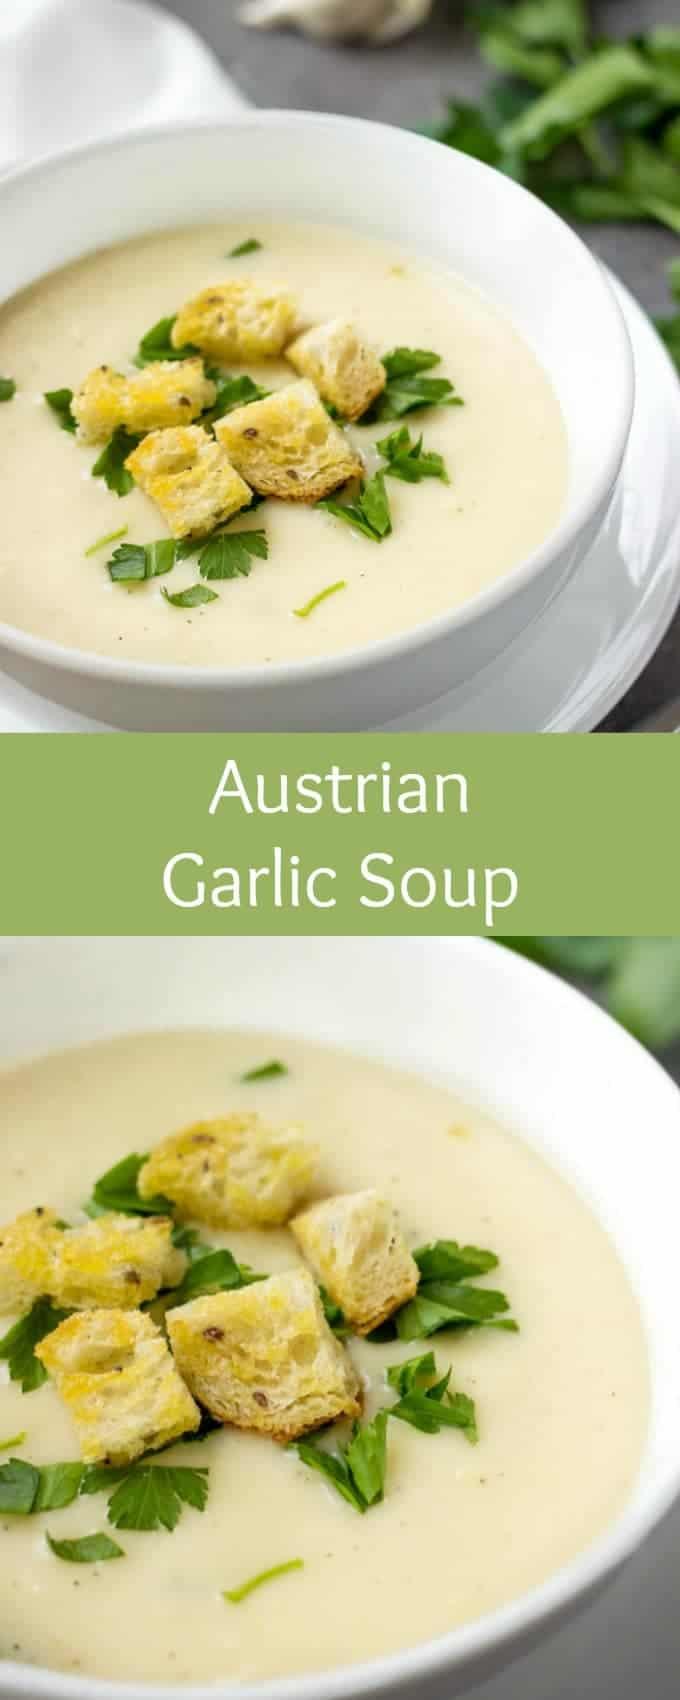 Austrian Garlic Soup | Garlic Soup For Colds | Garlic Soup Recipe | Cream of Garlic Soup